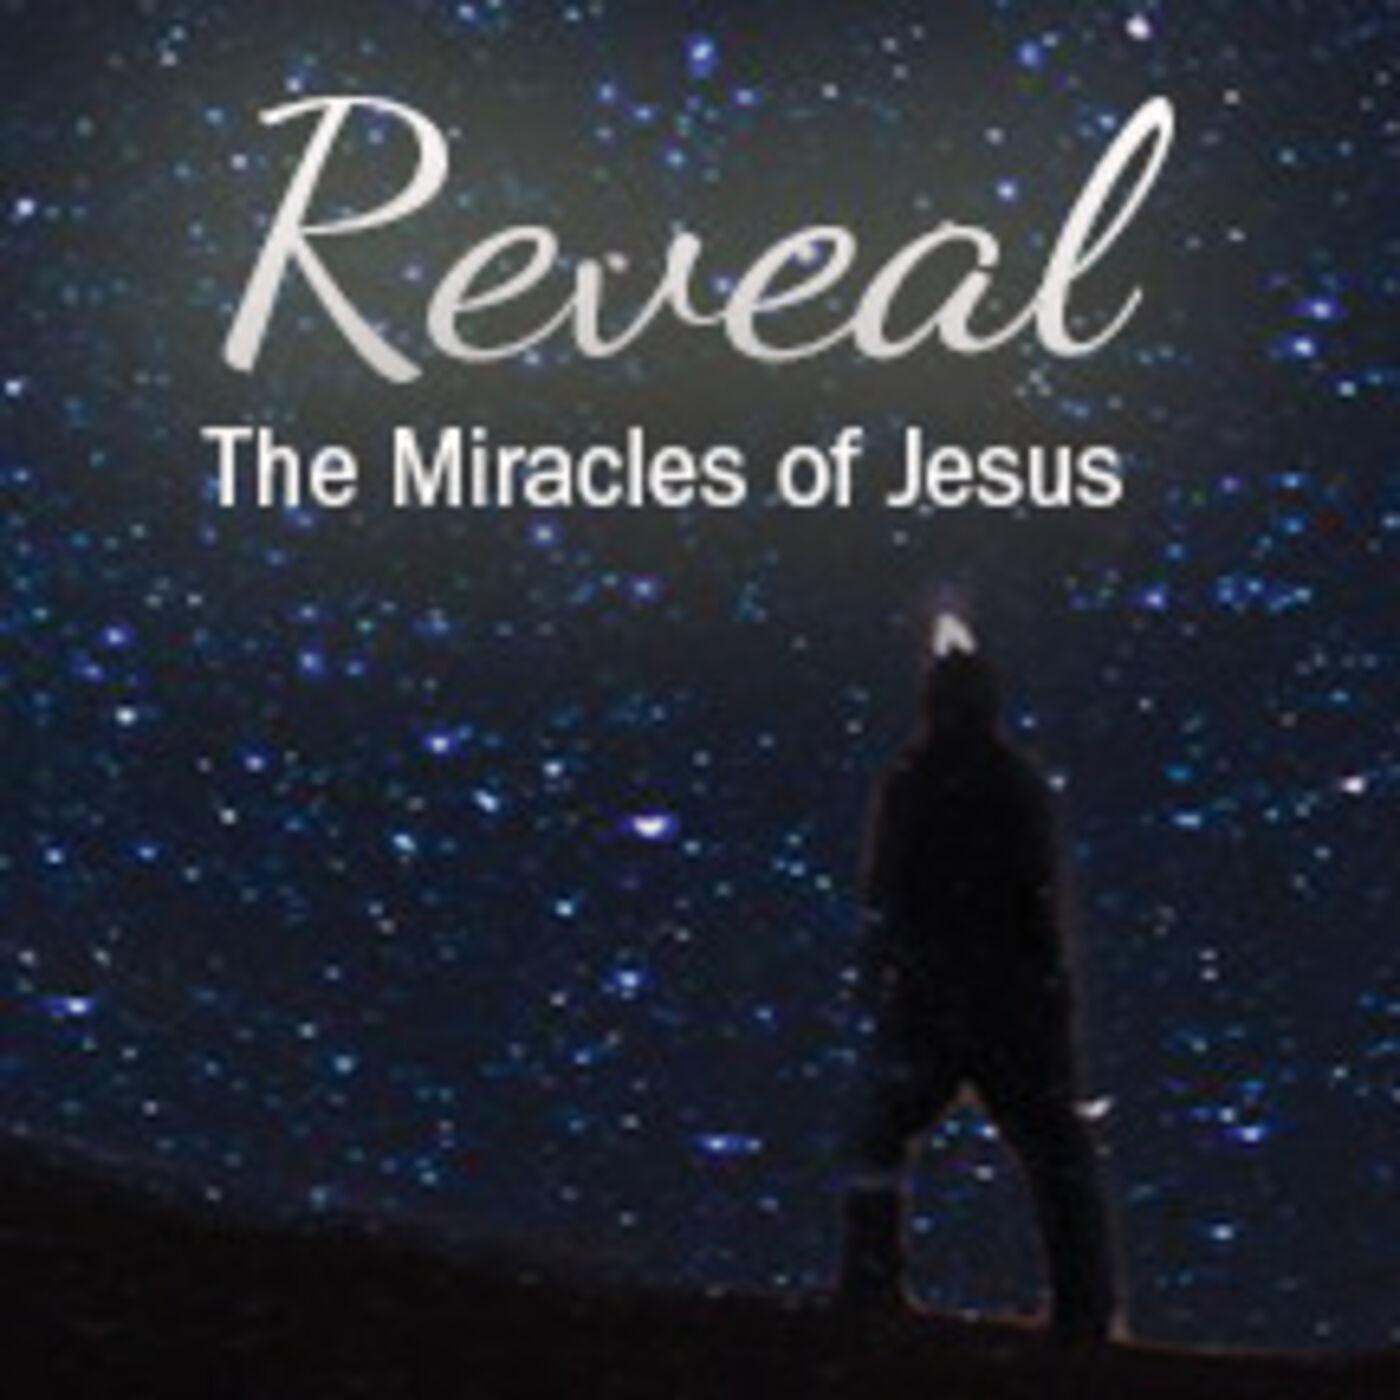 June 22/23: Jesus Heals & Forgives